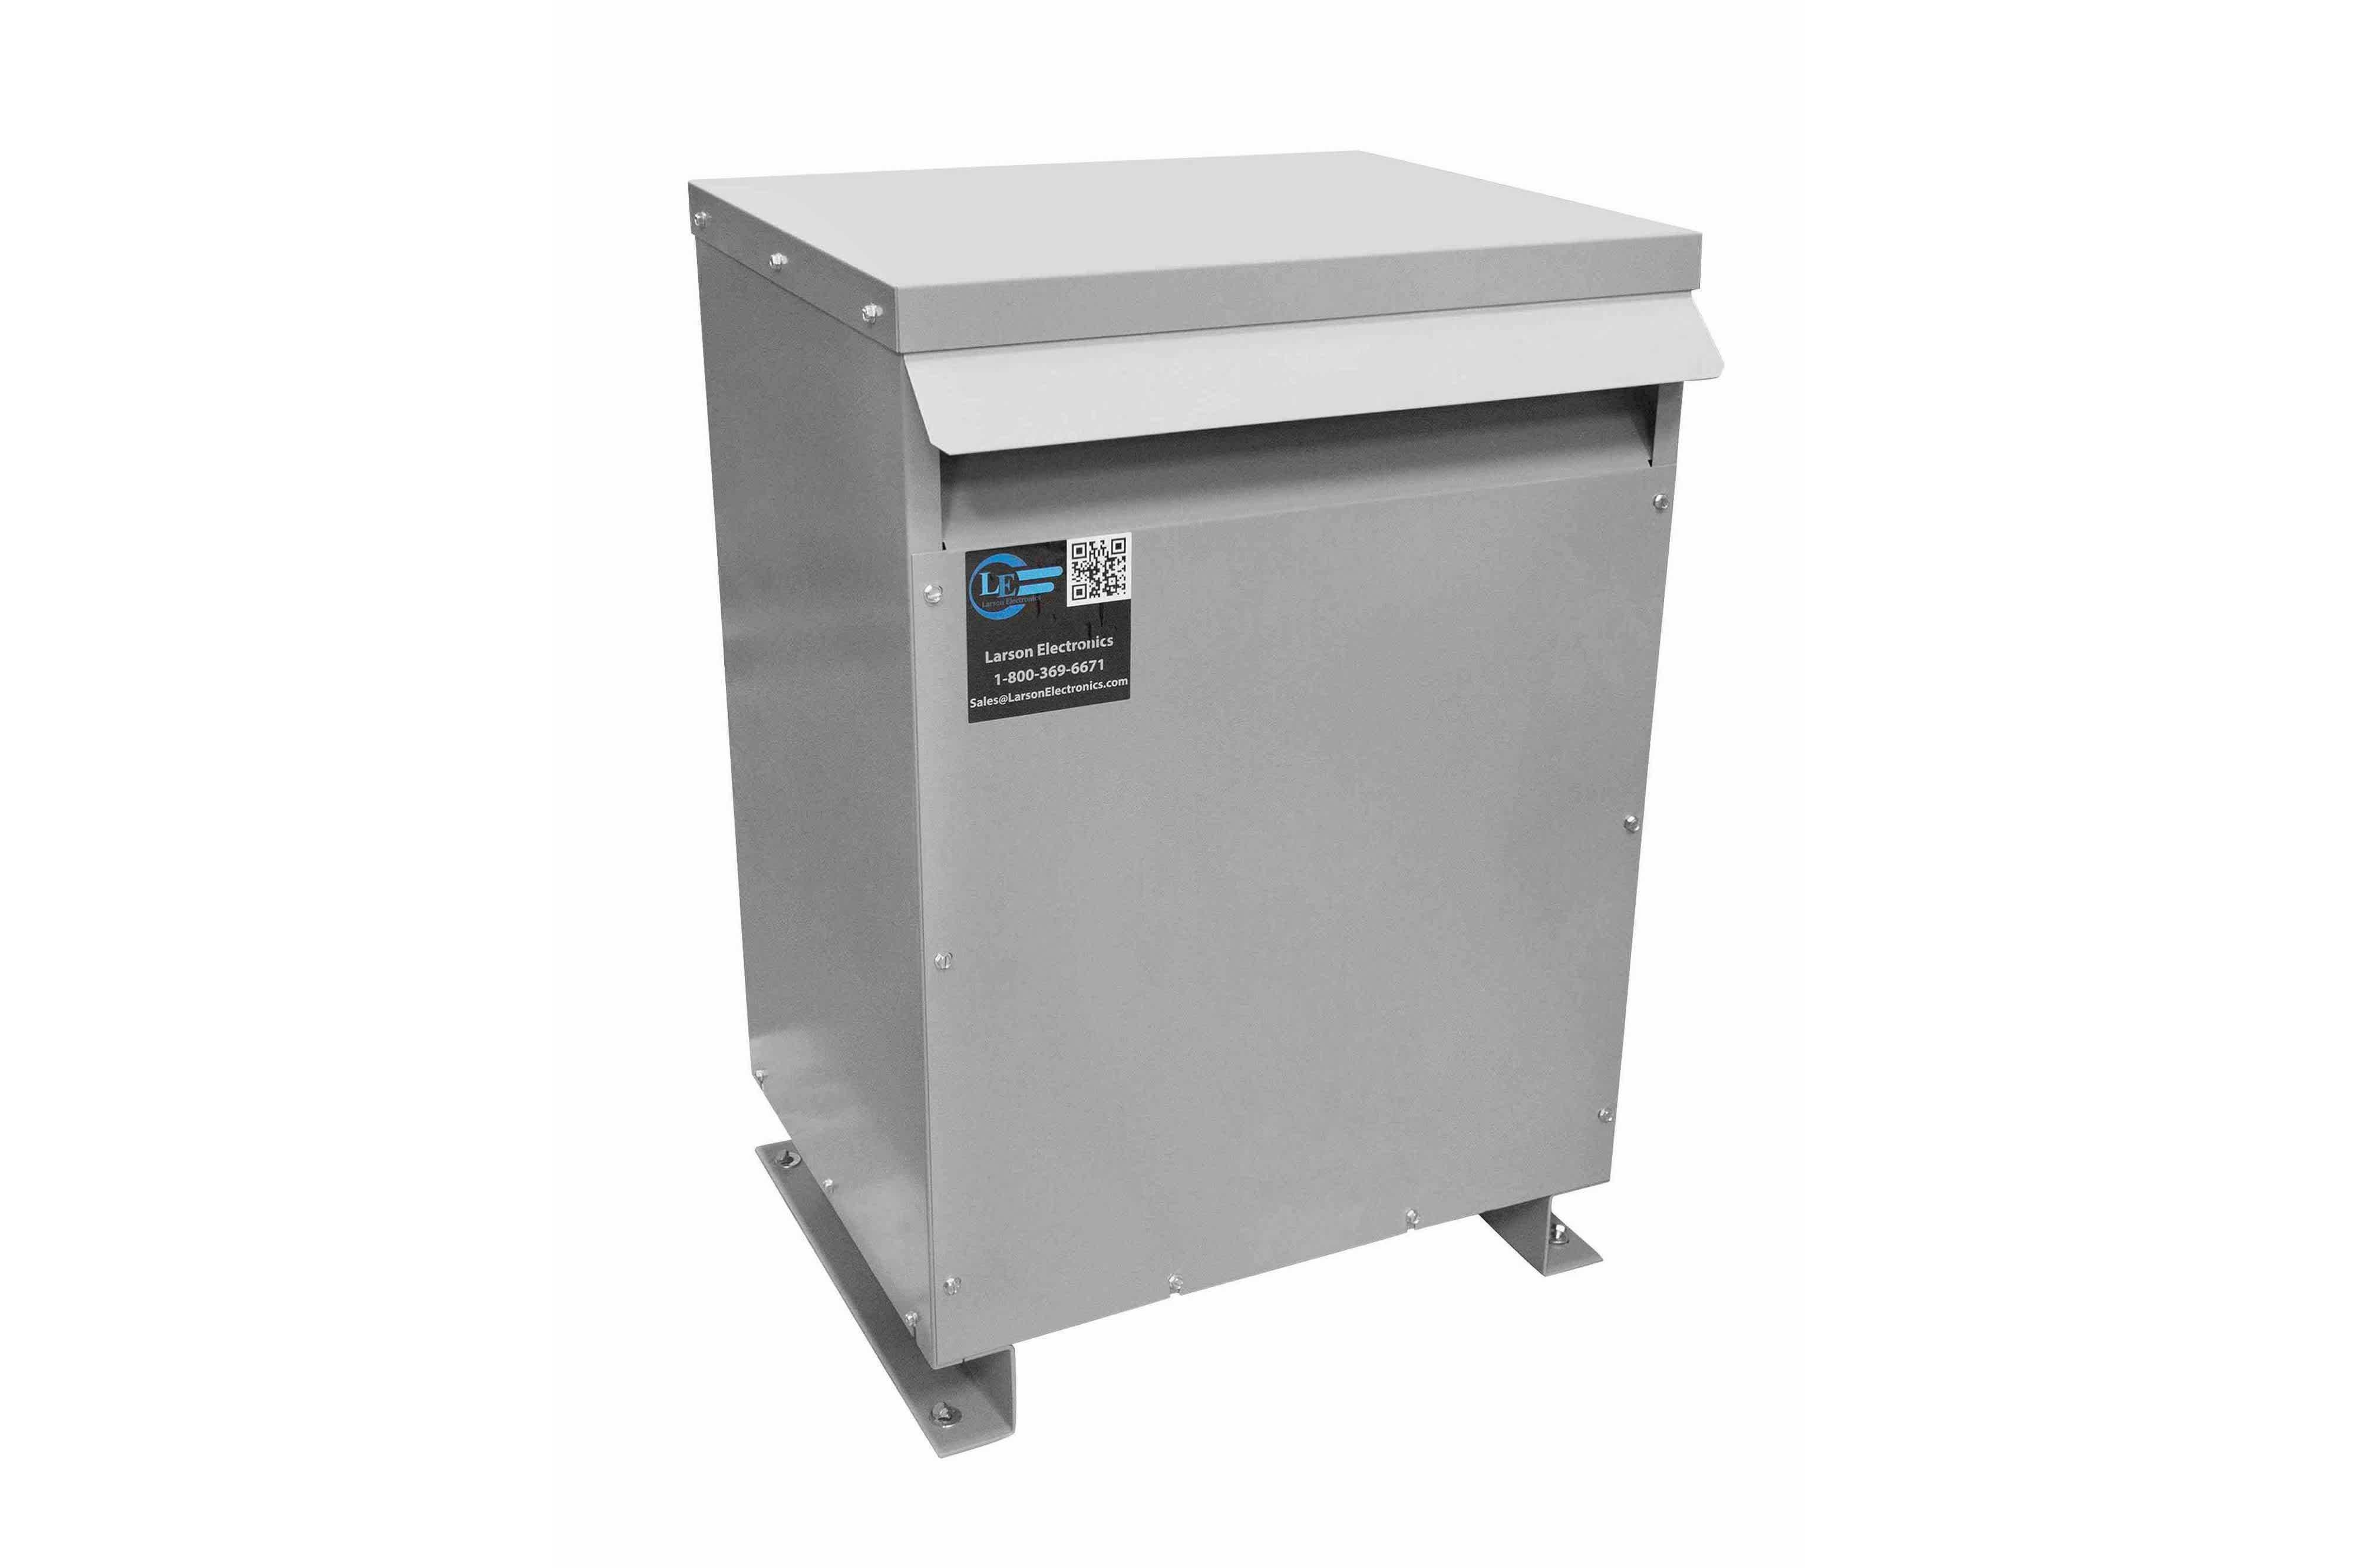 100 kVA 3PH Isolation Transformer, 460V Wye Primary, 415V Delta Secondary, N3R, Ventilated, 60 Hz